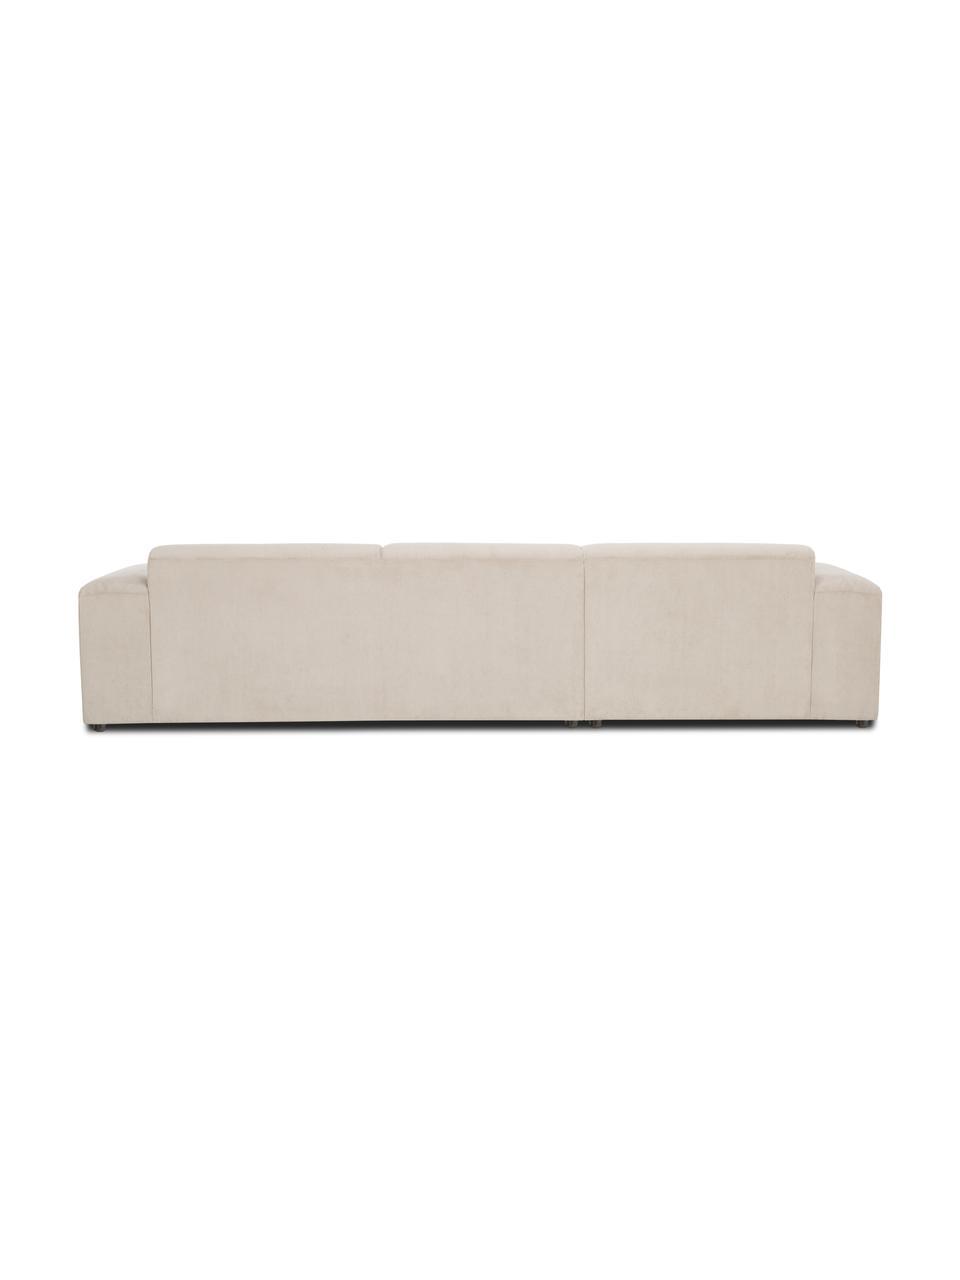 Ribfluwelen hoekbank Melva (4-zits) in beige, Bekleding: corduroy (92% polyester, , Frame: massief grenenhout, FSC-g, Poten: kunststof, Corduroy beige, B 319 x D 196 cm